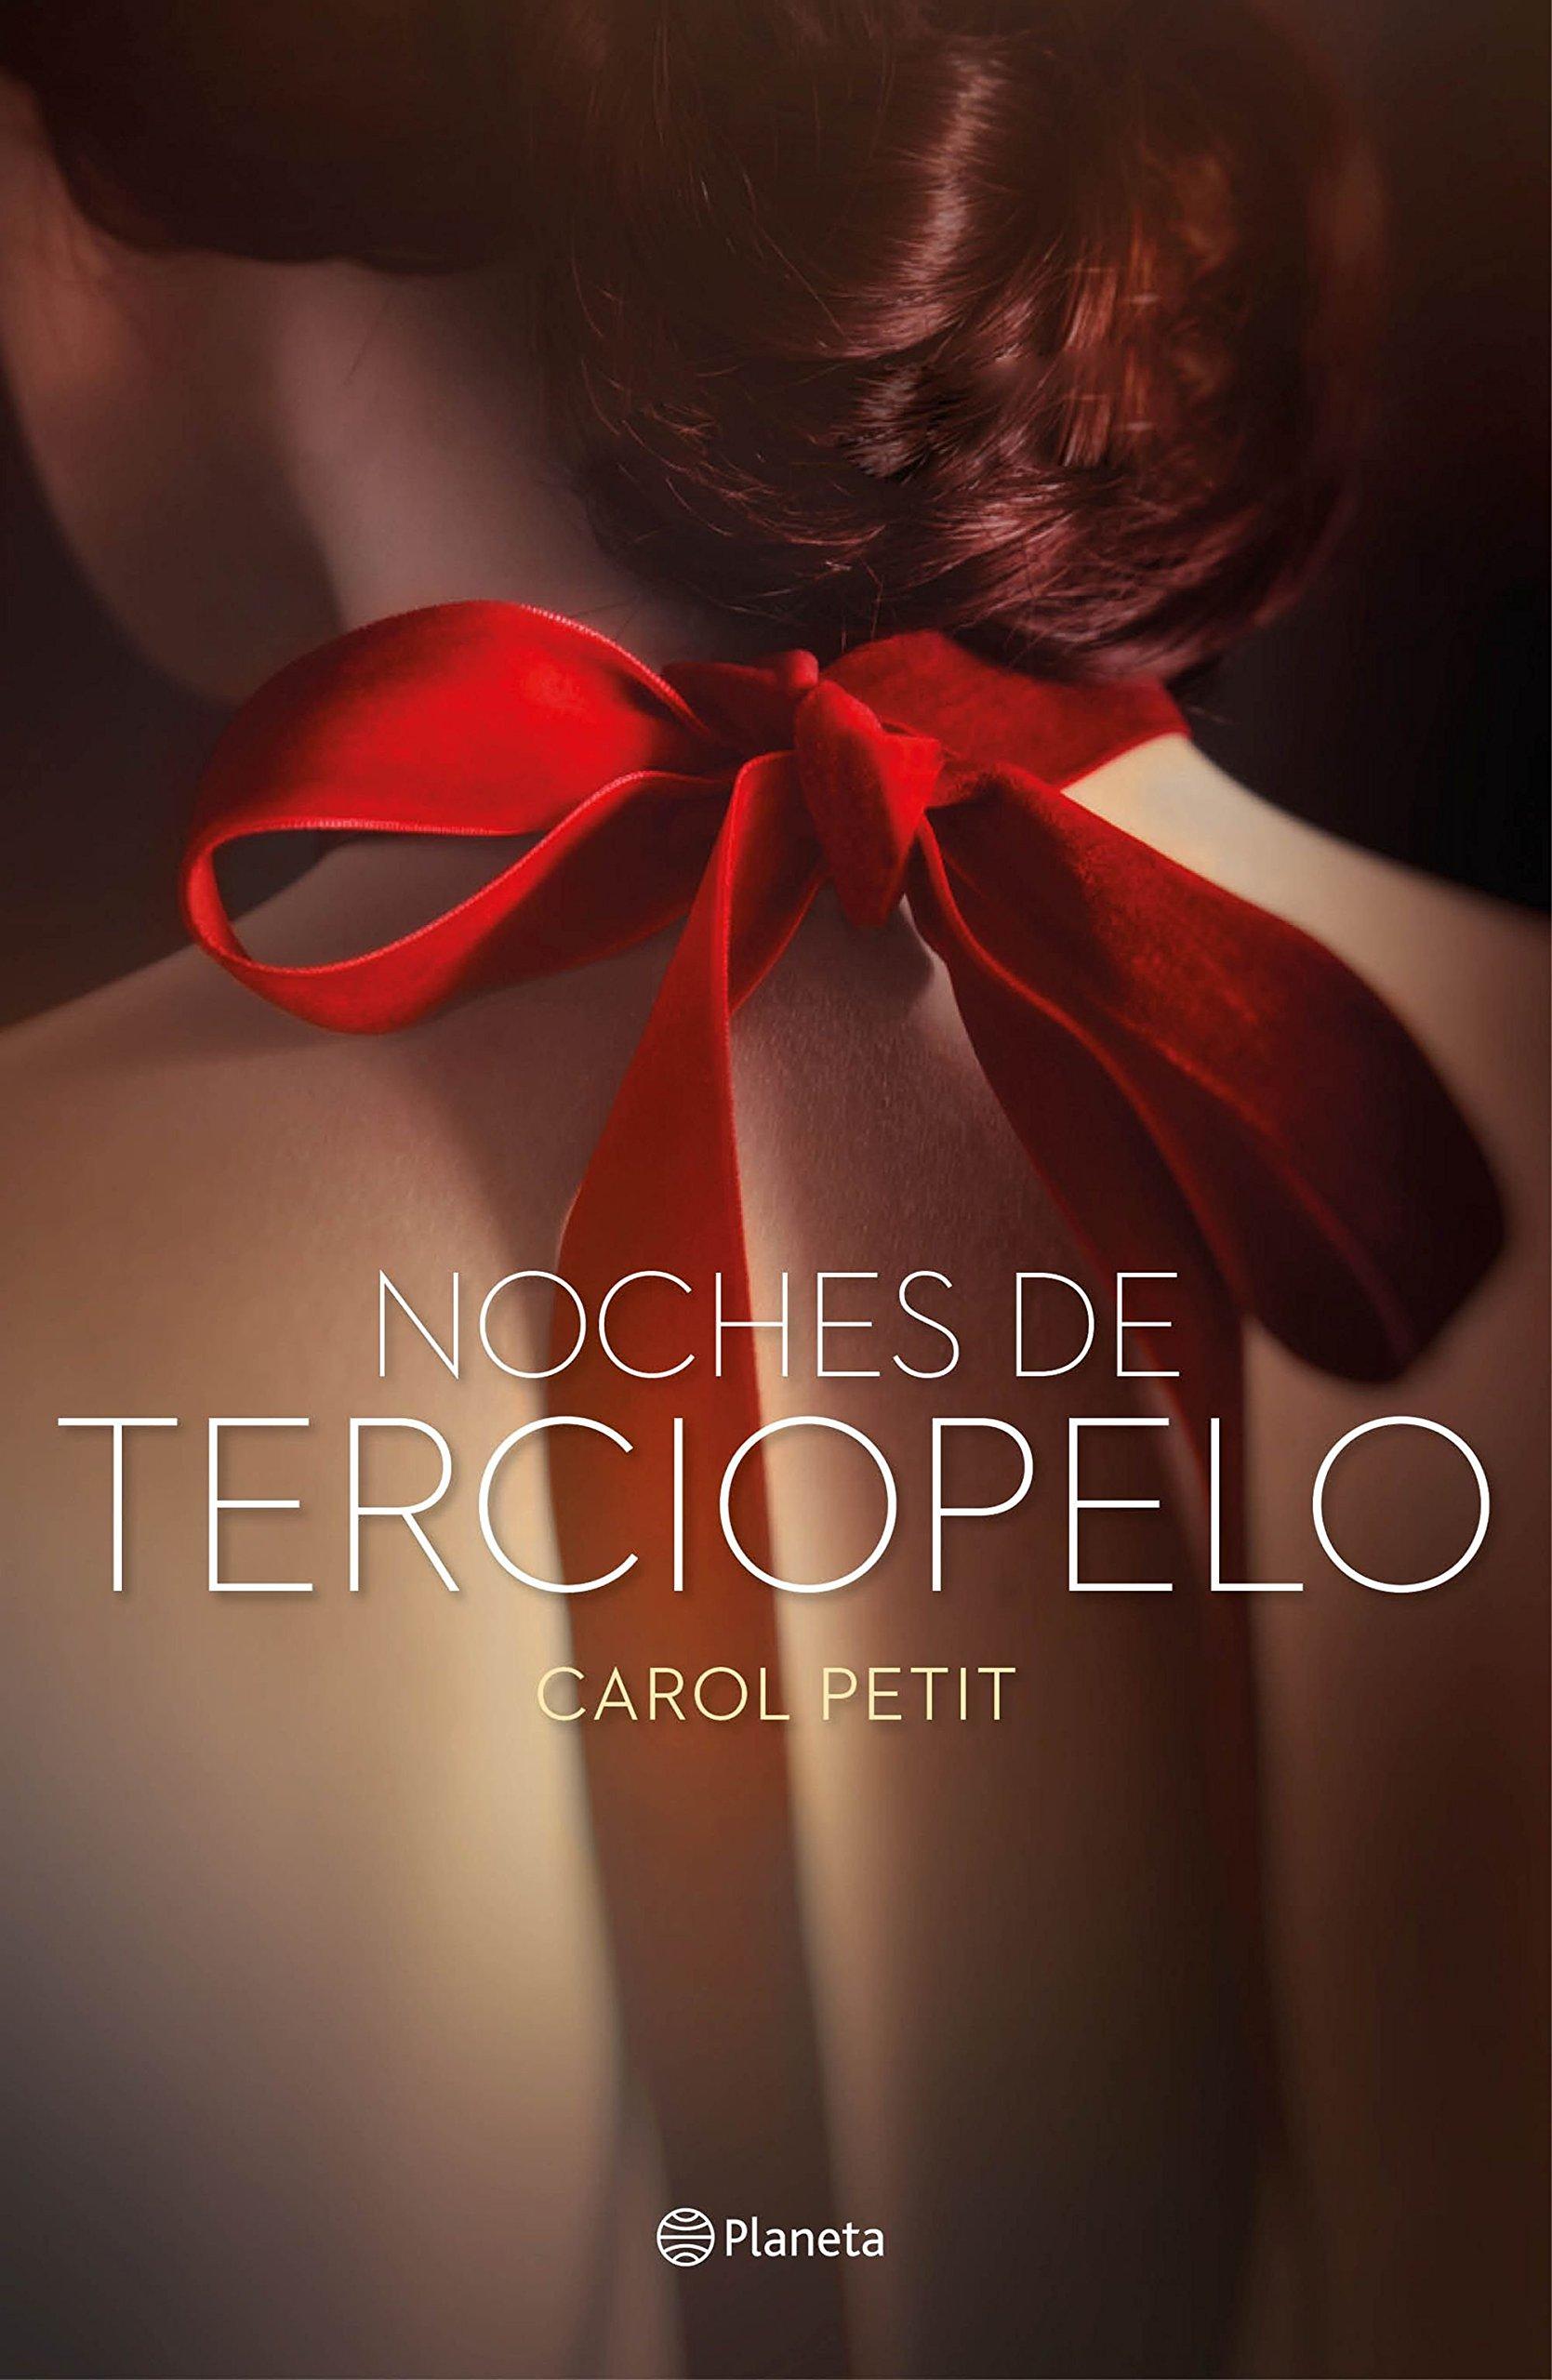 Velvet Noches De Terciopelo Carol Petit Libros Más Vendidos